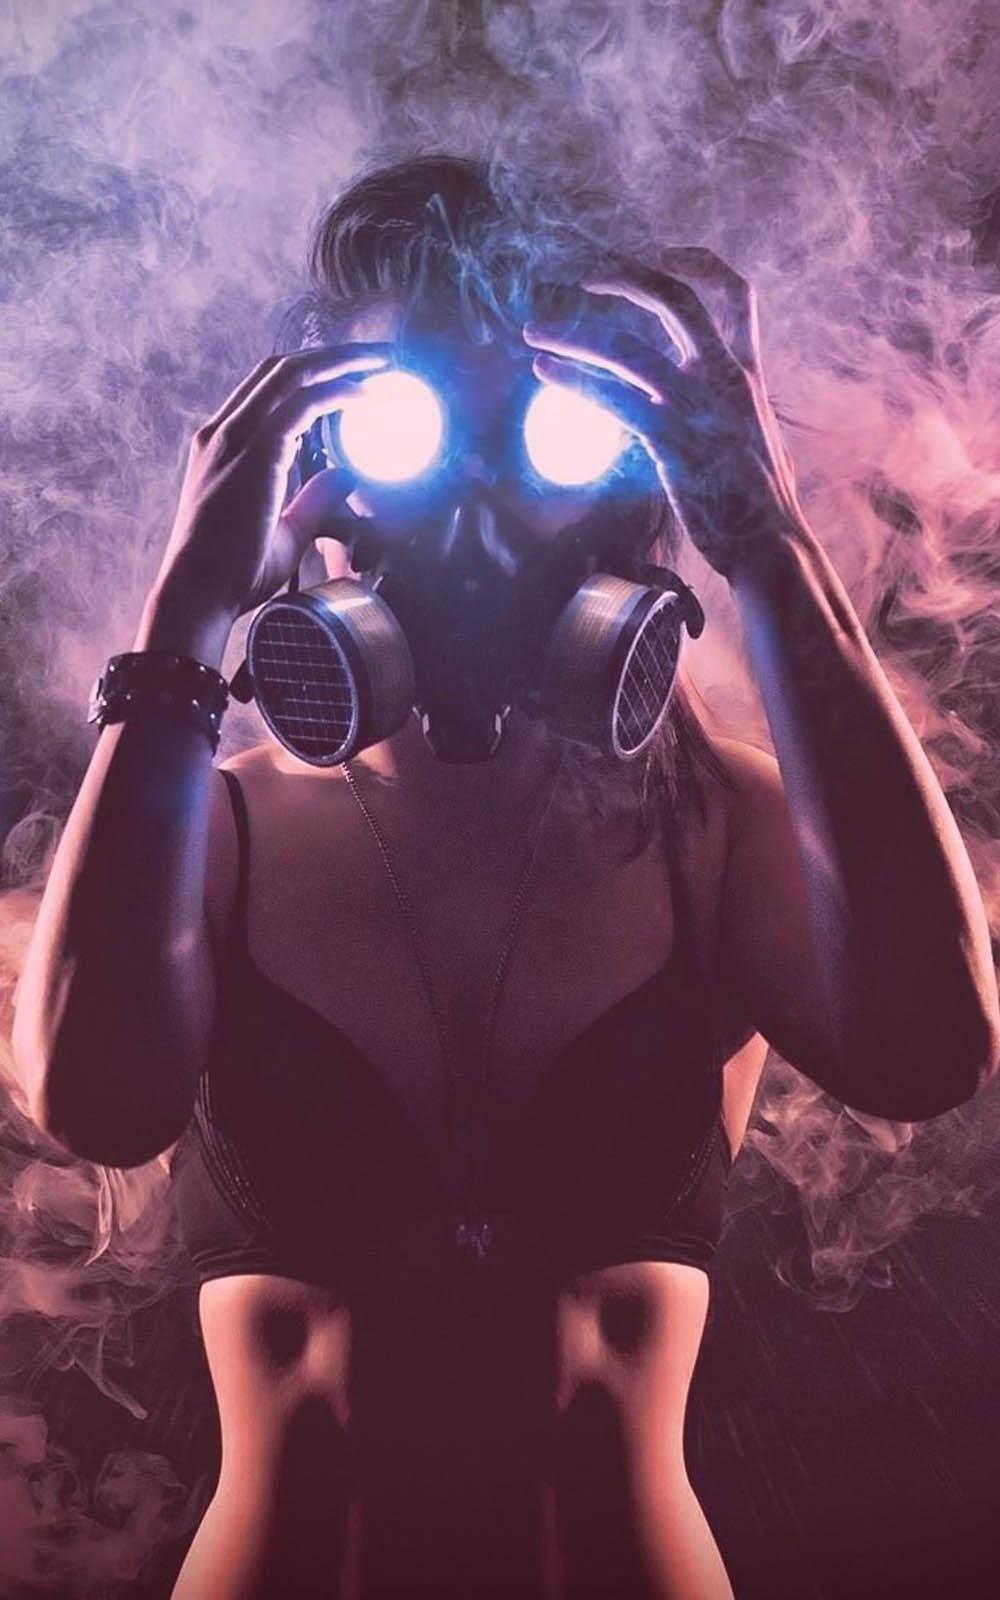 Download Hot Girl Wearing Gas Mask Free Pure 4k Ultra Hd